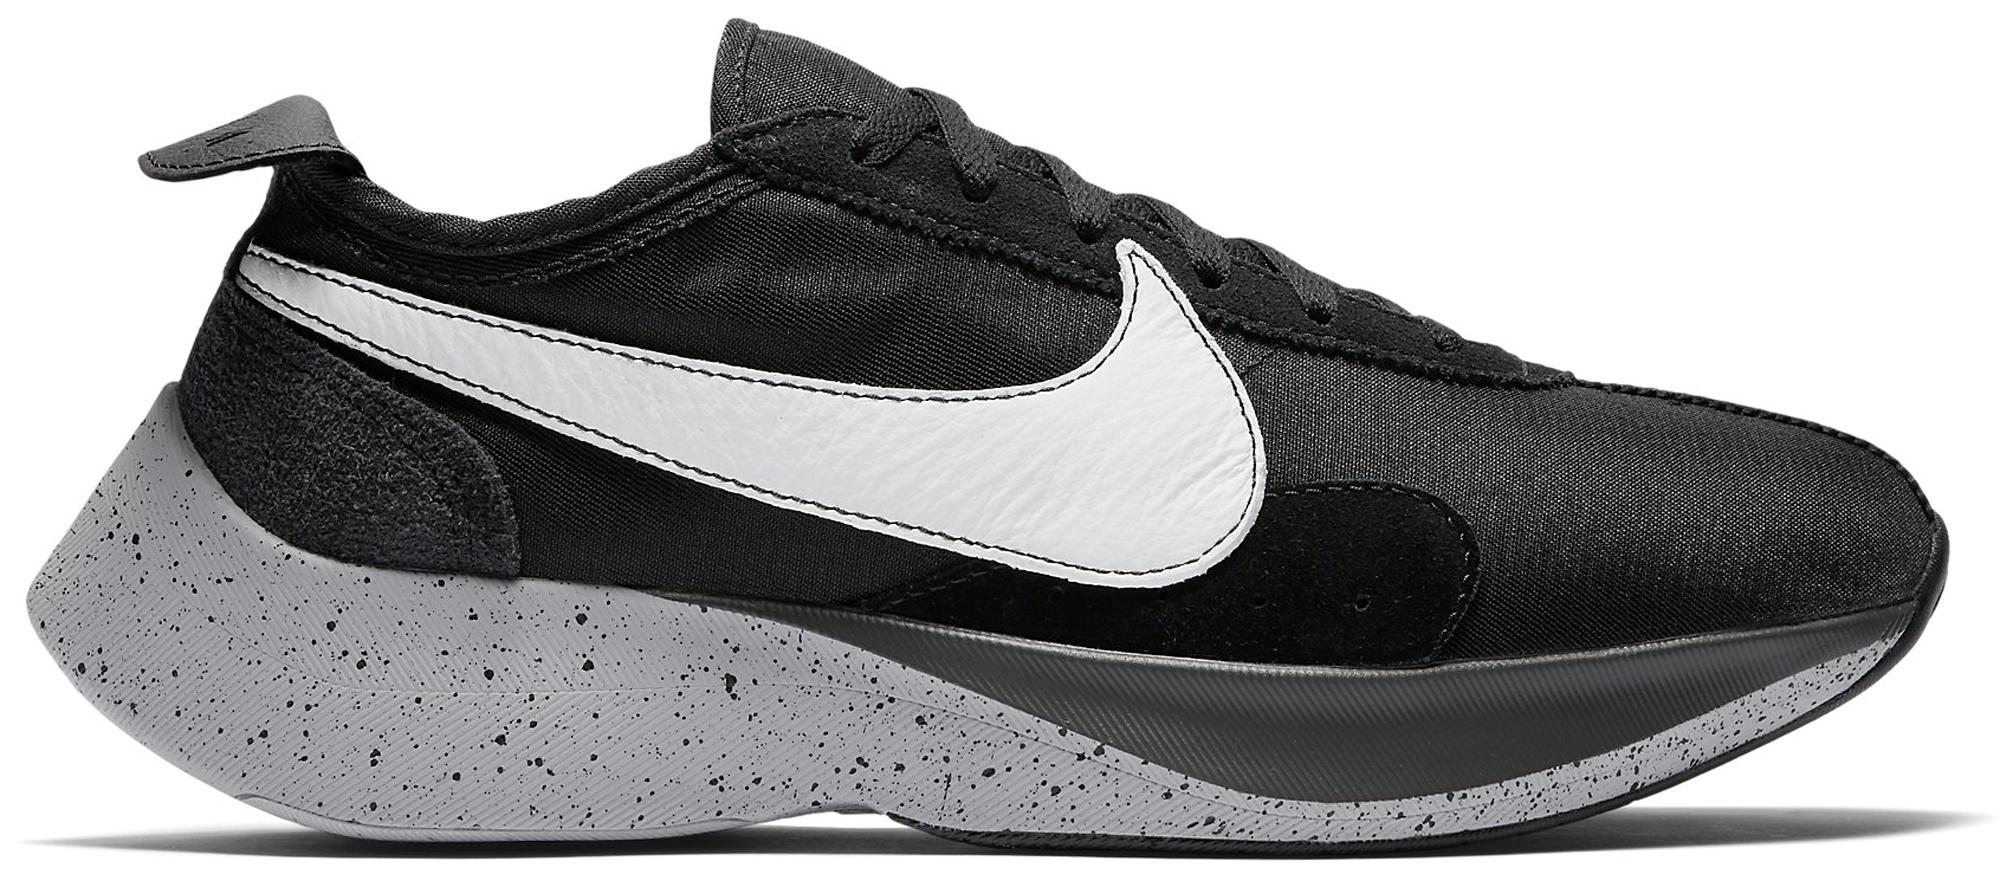 release date 407c7 f6095 Nike Moon Racer Black Wolf Grey